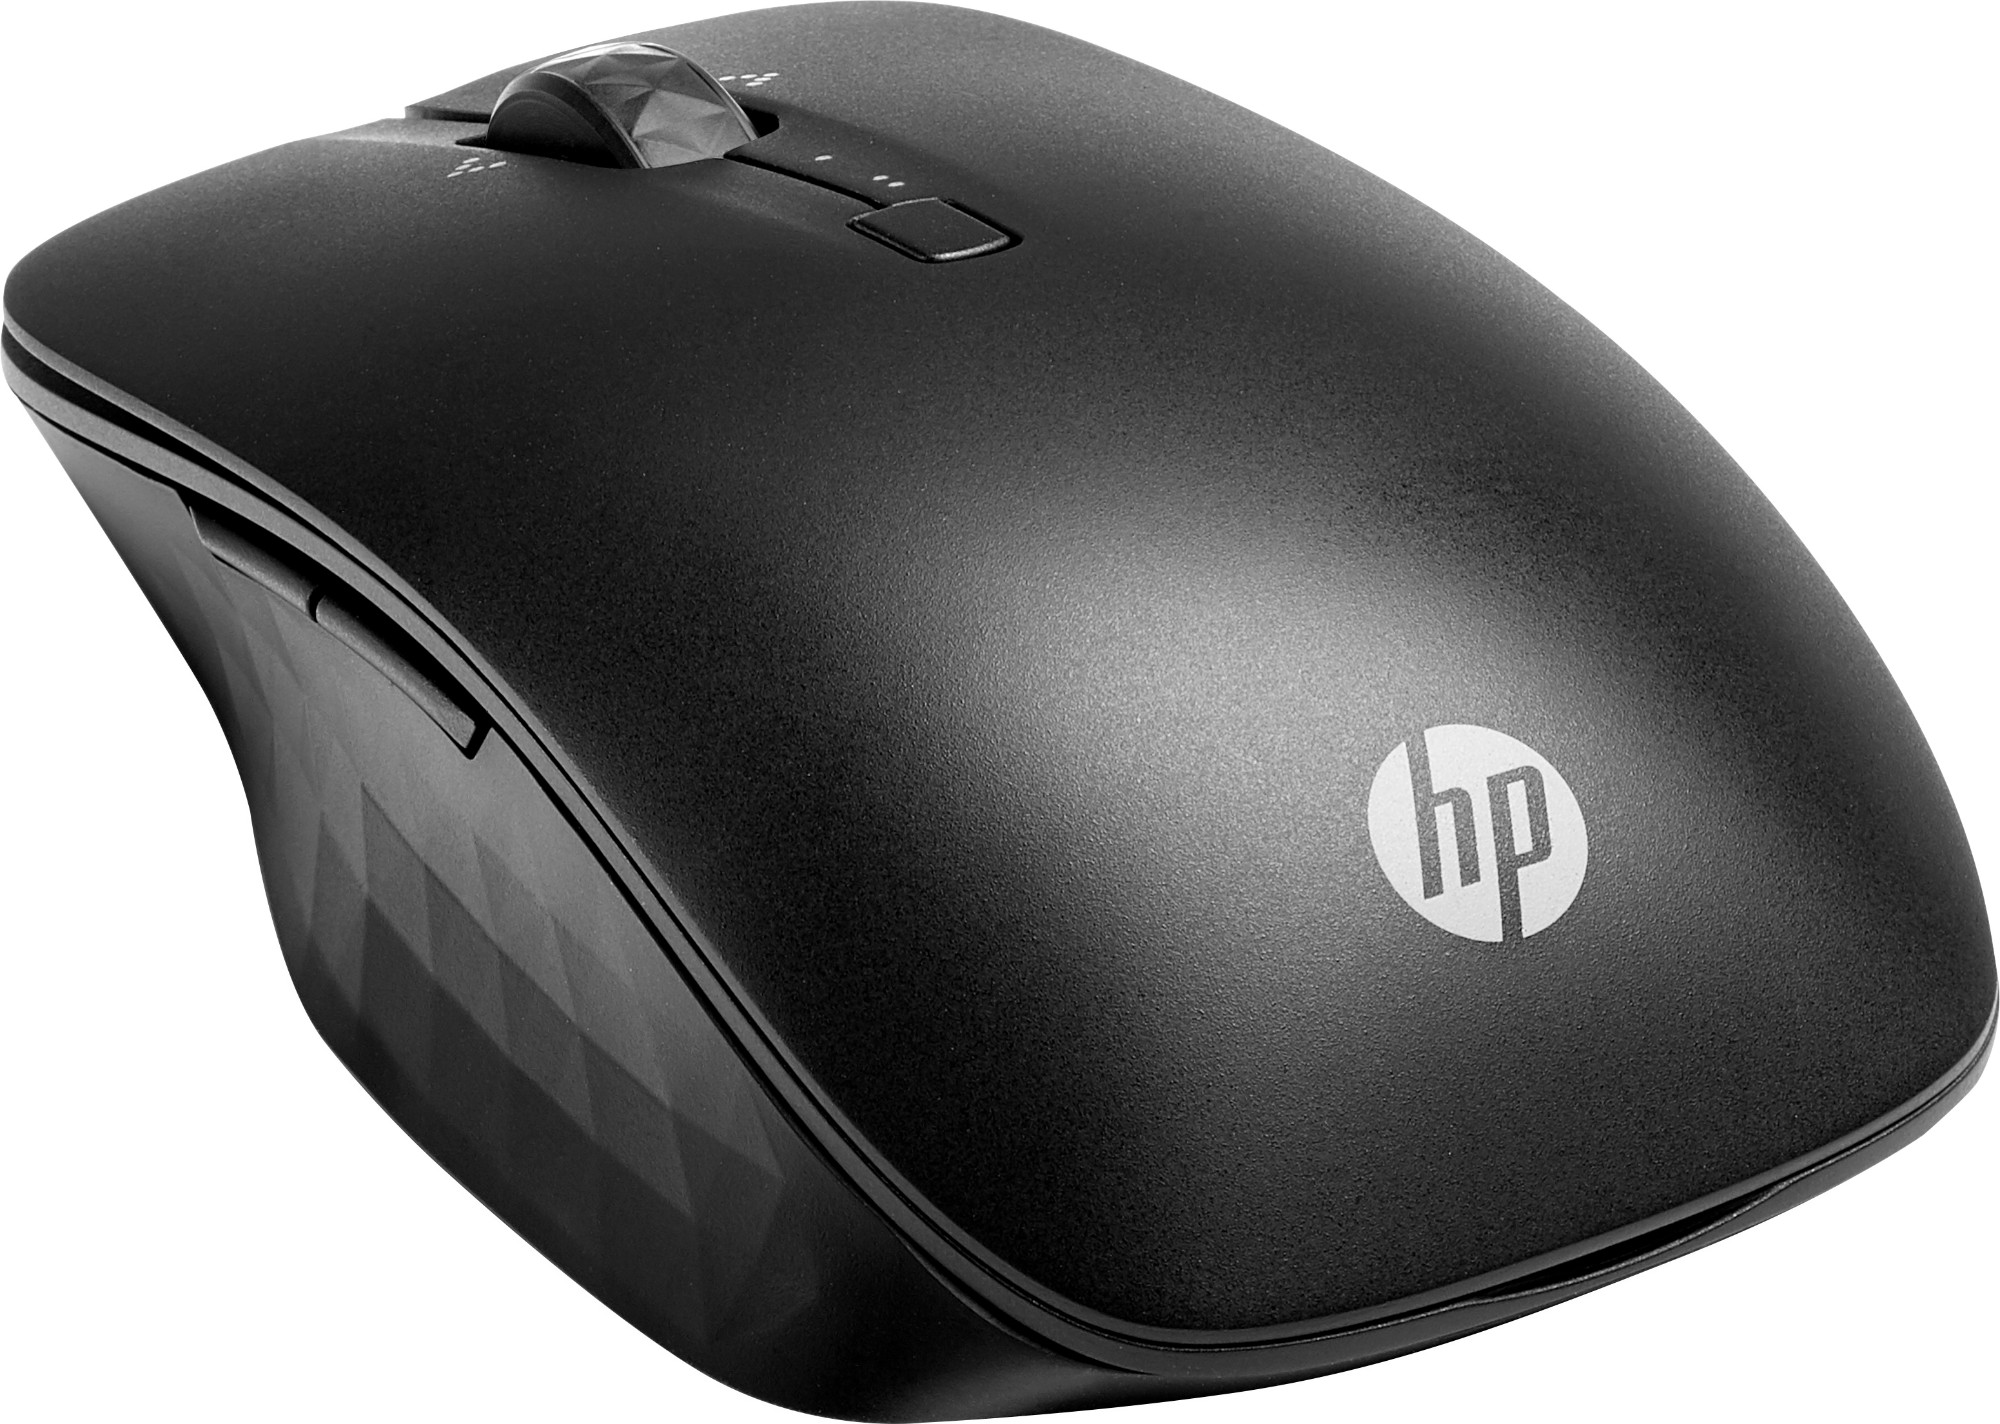 HP 6SP30AA ratón Bluetooth Track-on-glass (TOG) 1200 DPI mano derecha